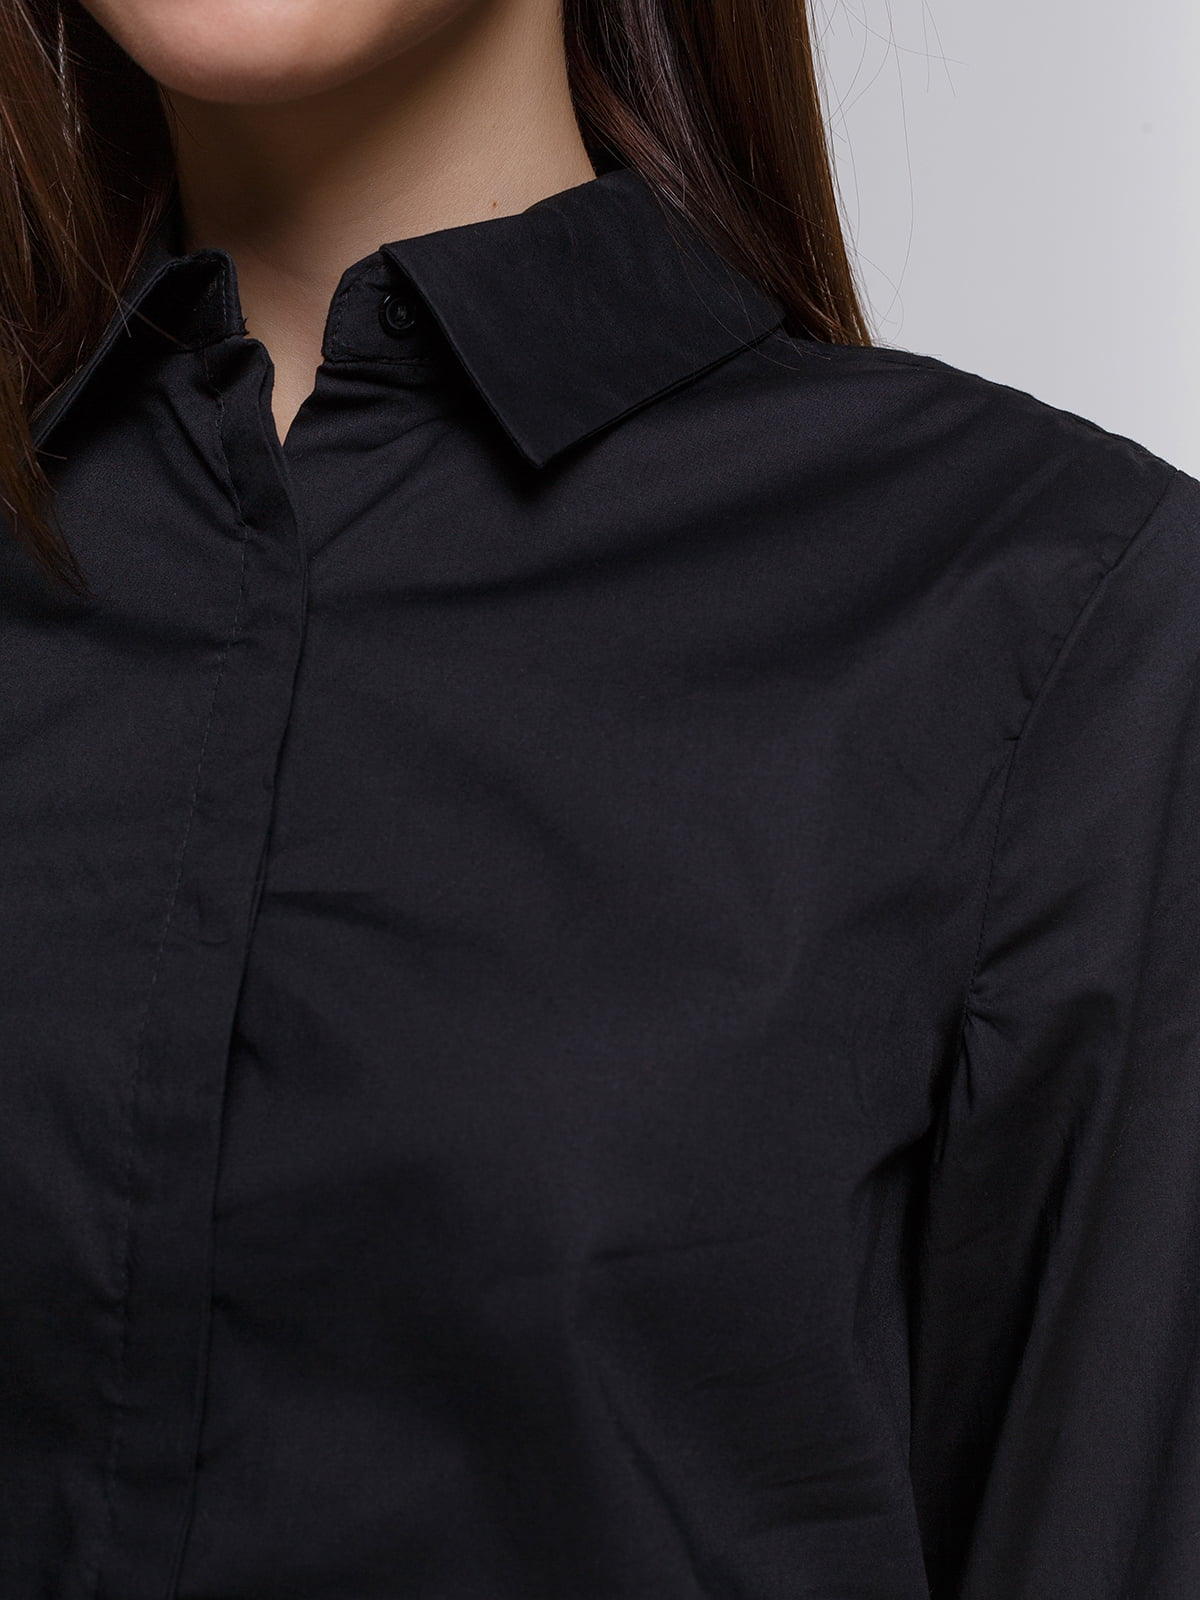 Рубашка черная   1943751   фото 3